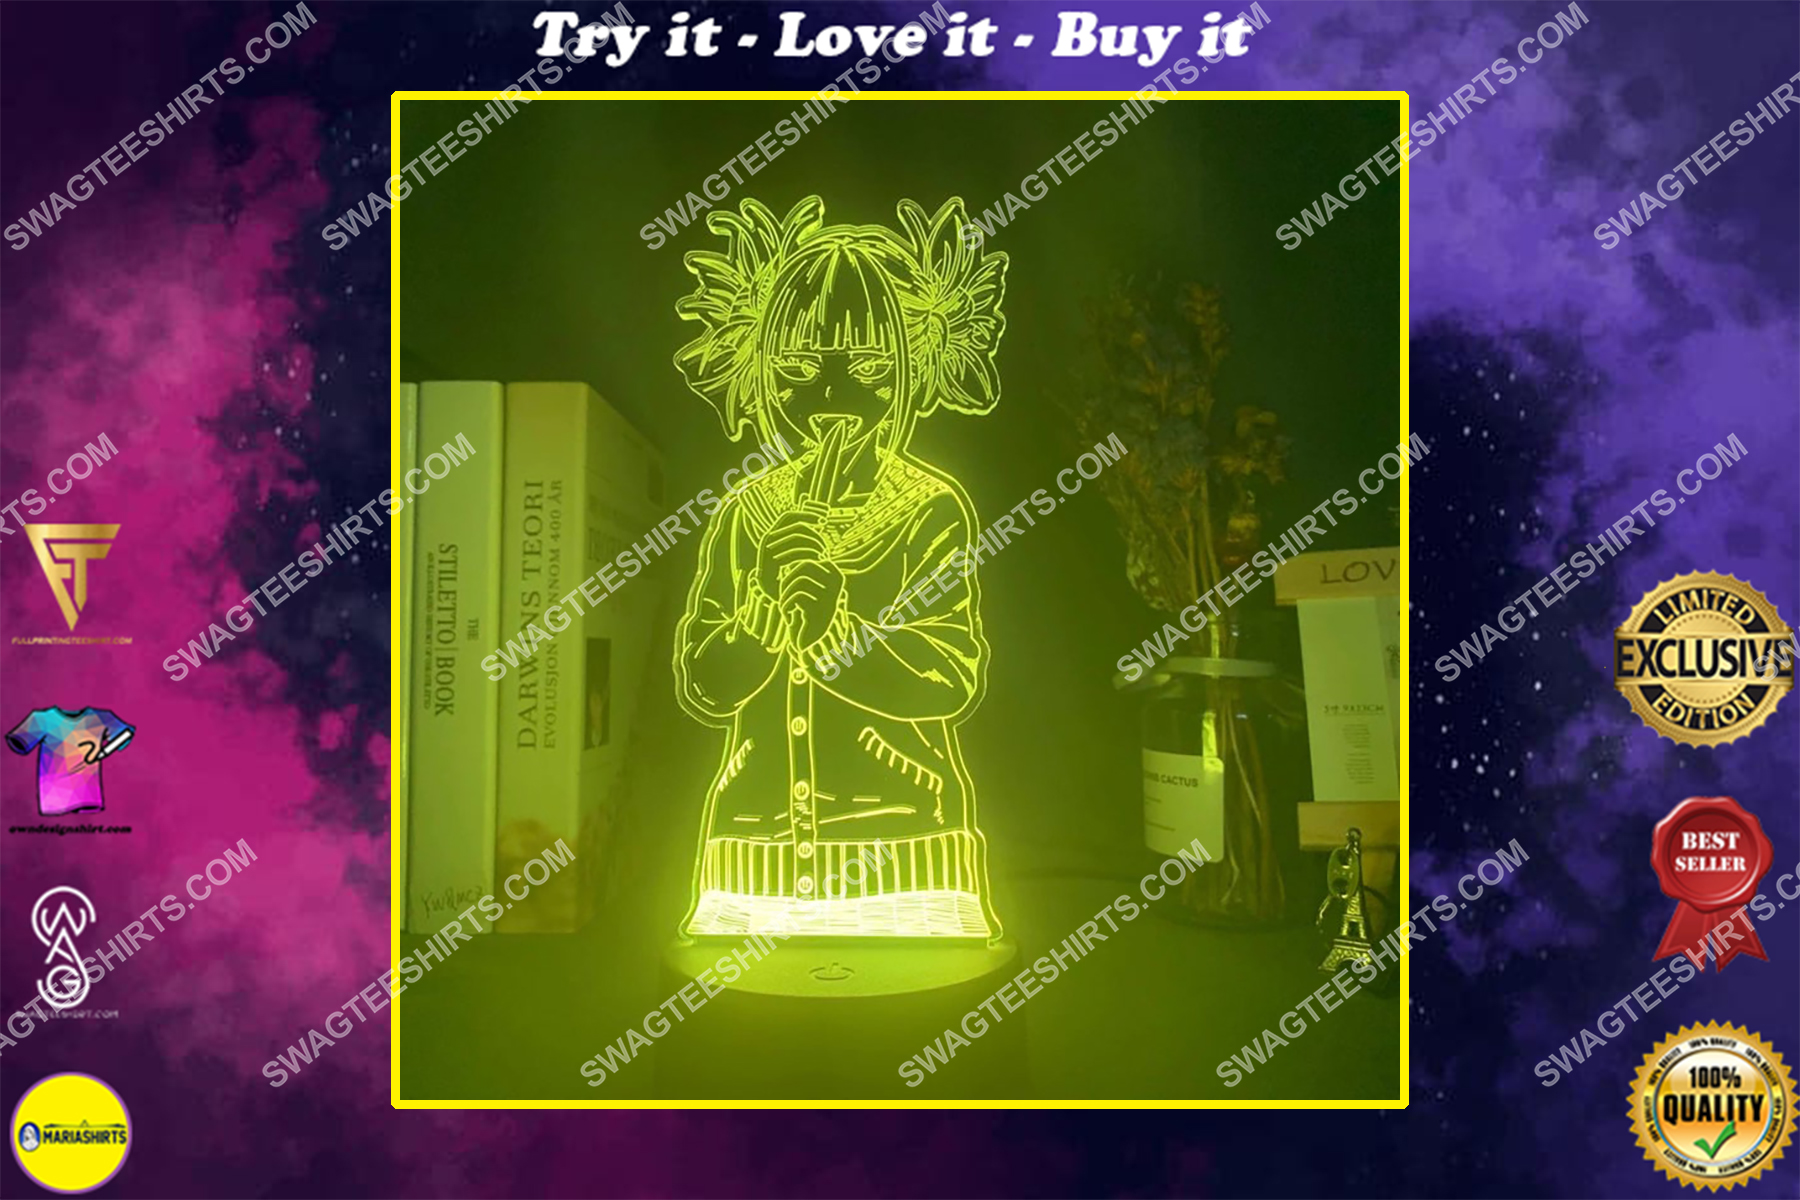 My hero academia toga himiko figure 3d night light led